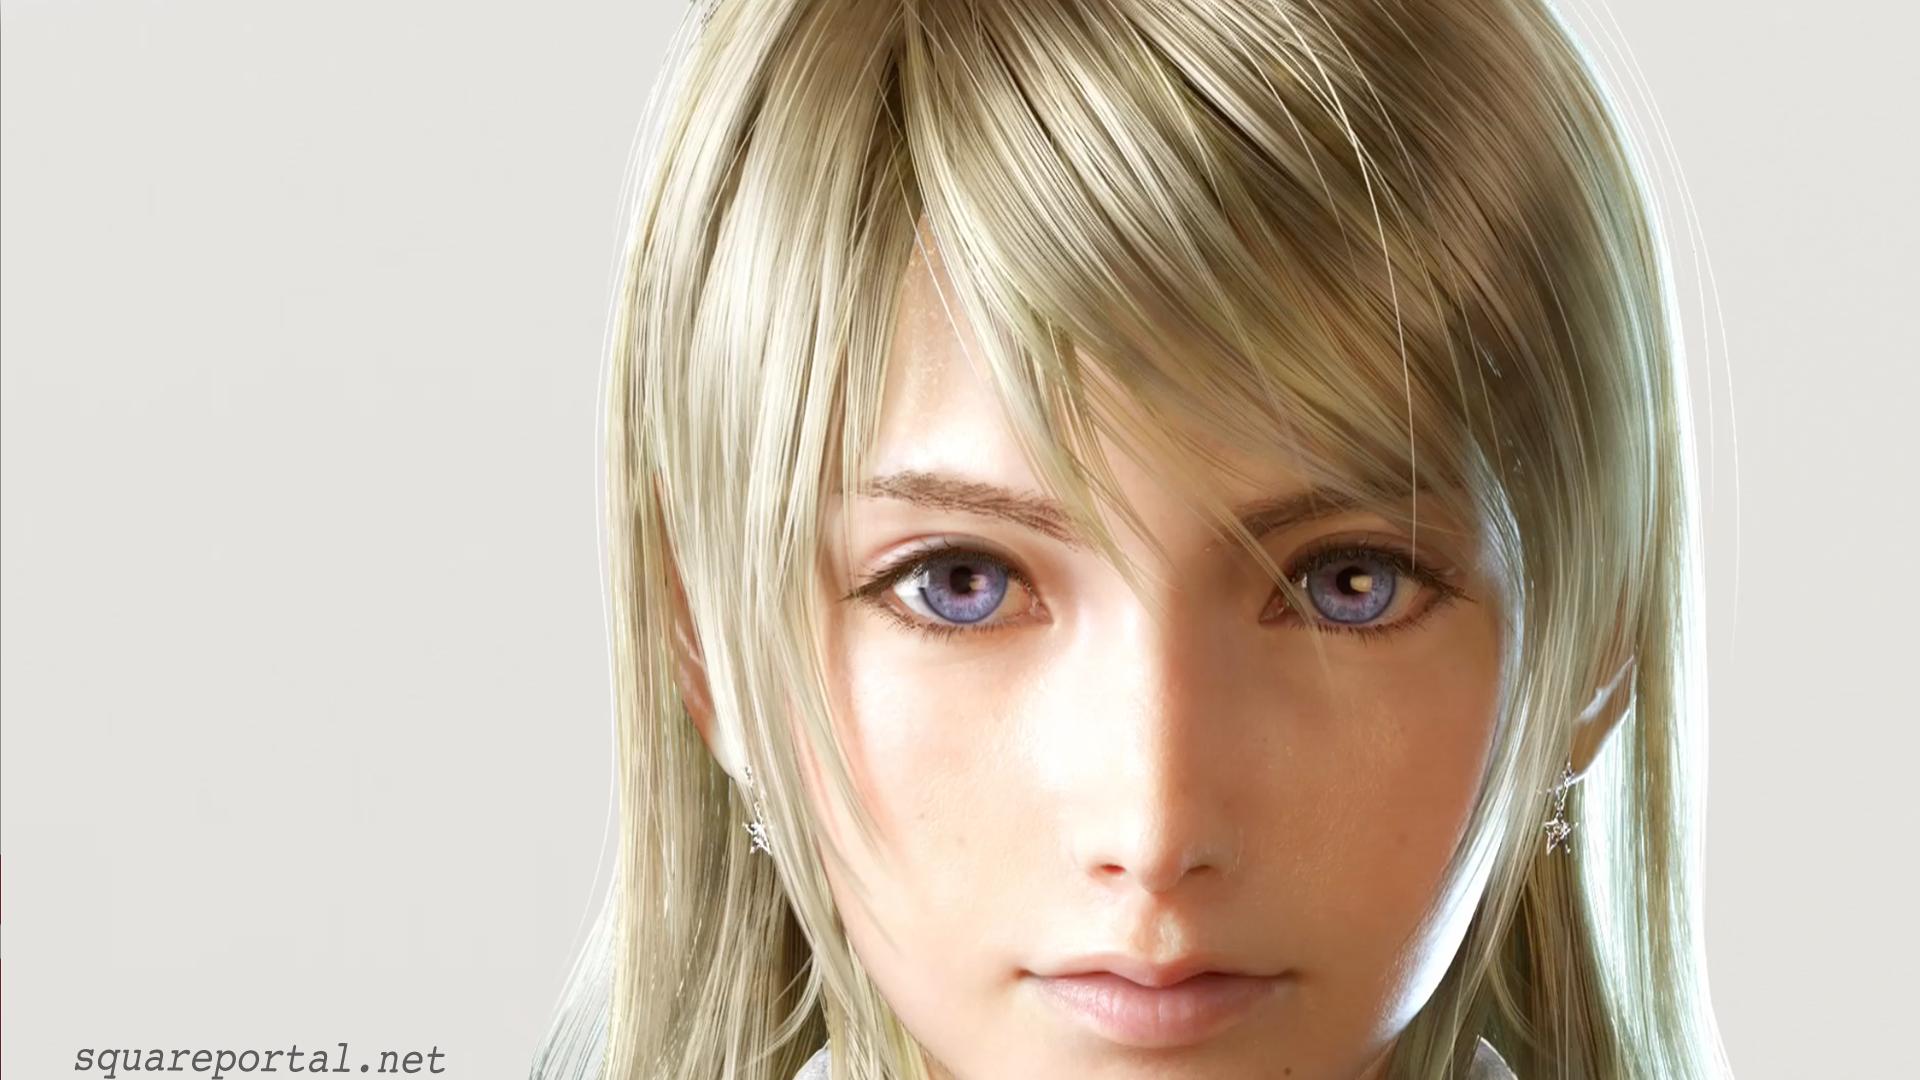 Final Fantasy Xv Wallpaper 4k Whit New Prompto By: Final Fantasy XV Wallpapers [E3 2013]